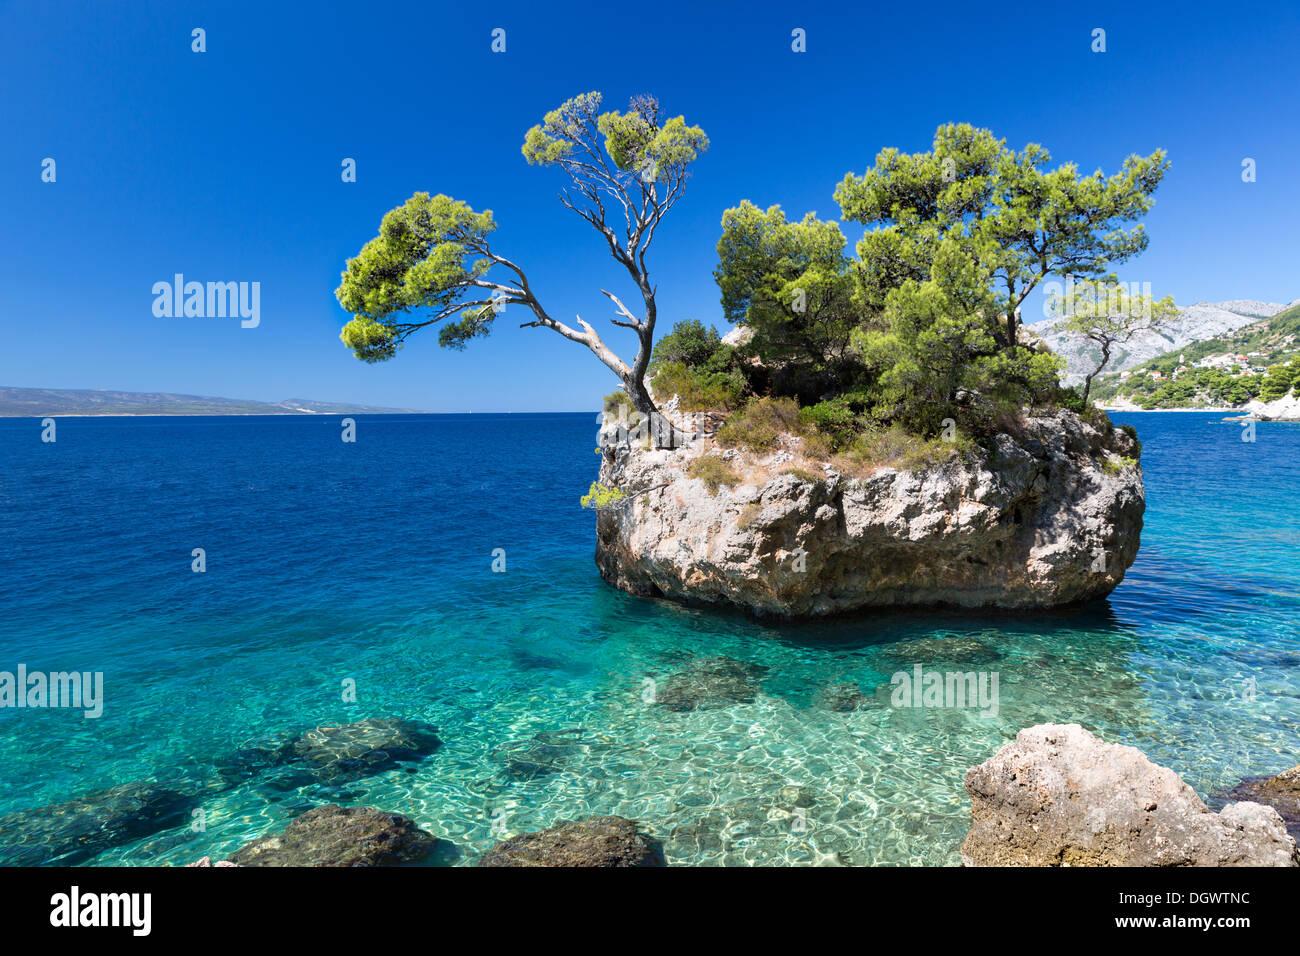 Croatian beach at a sunny day, Brela, Croatia Stock Photo